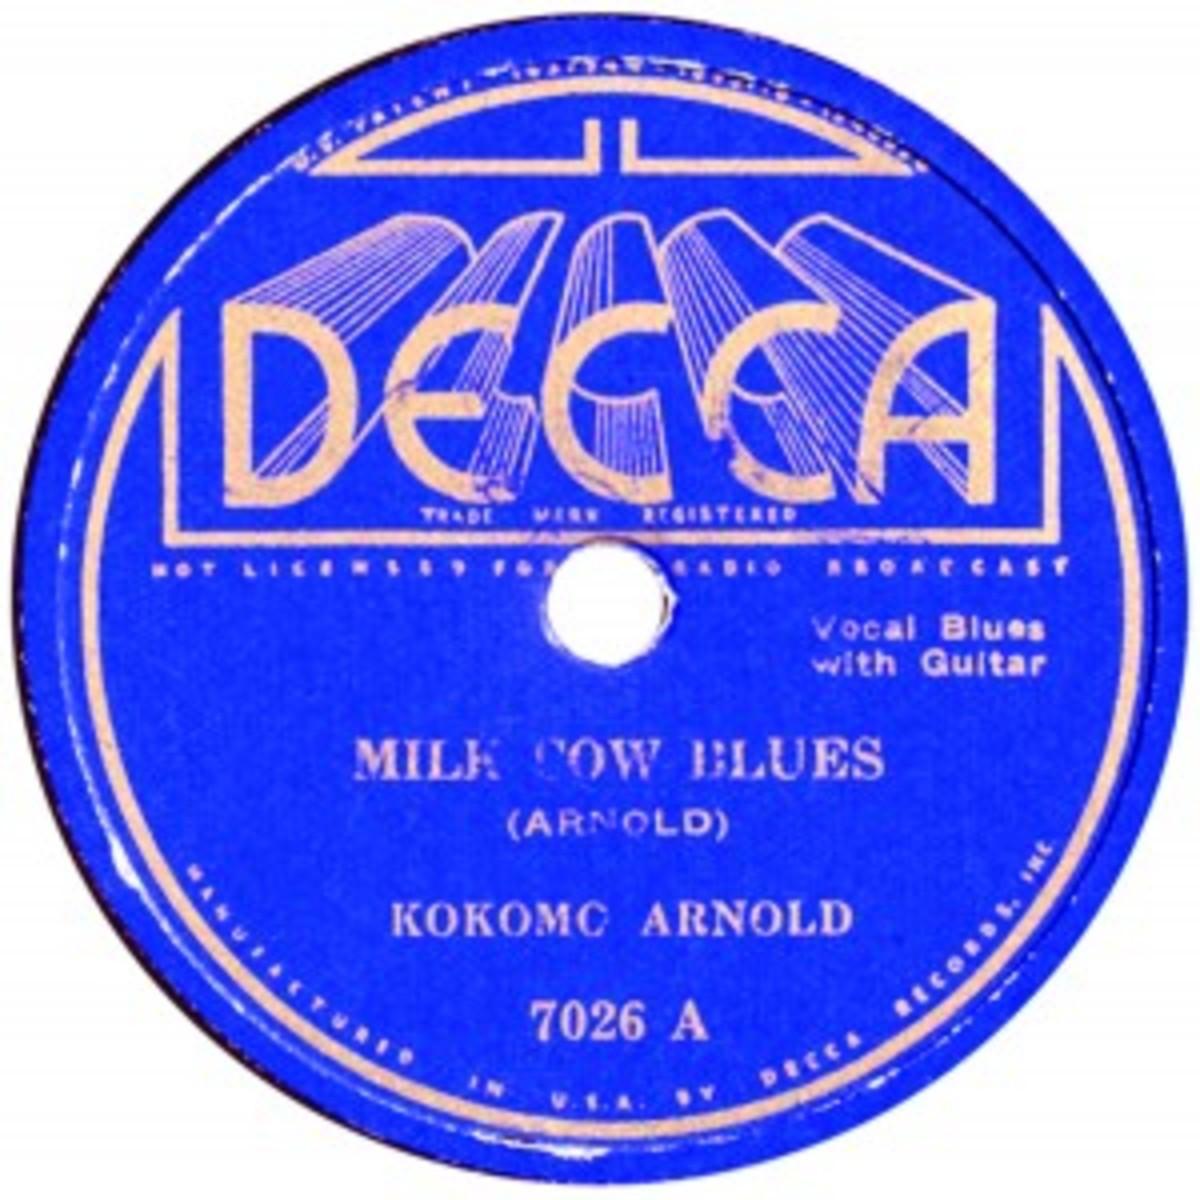 Kokomo Arnold Milk Cow Blues Decca 7026